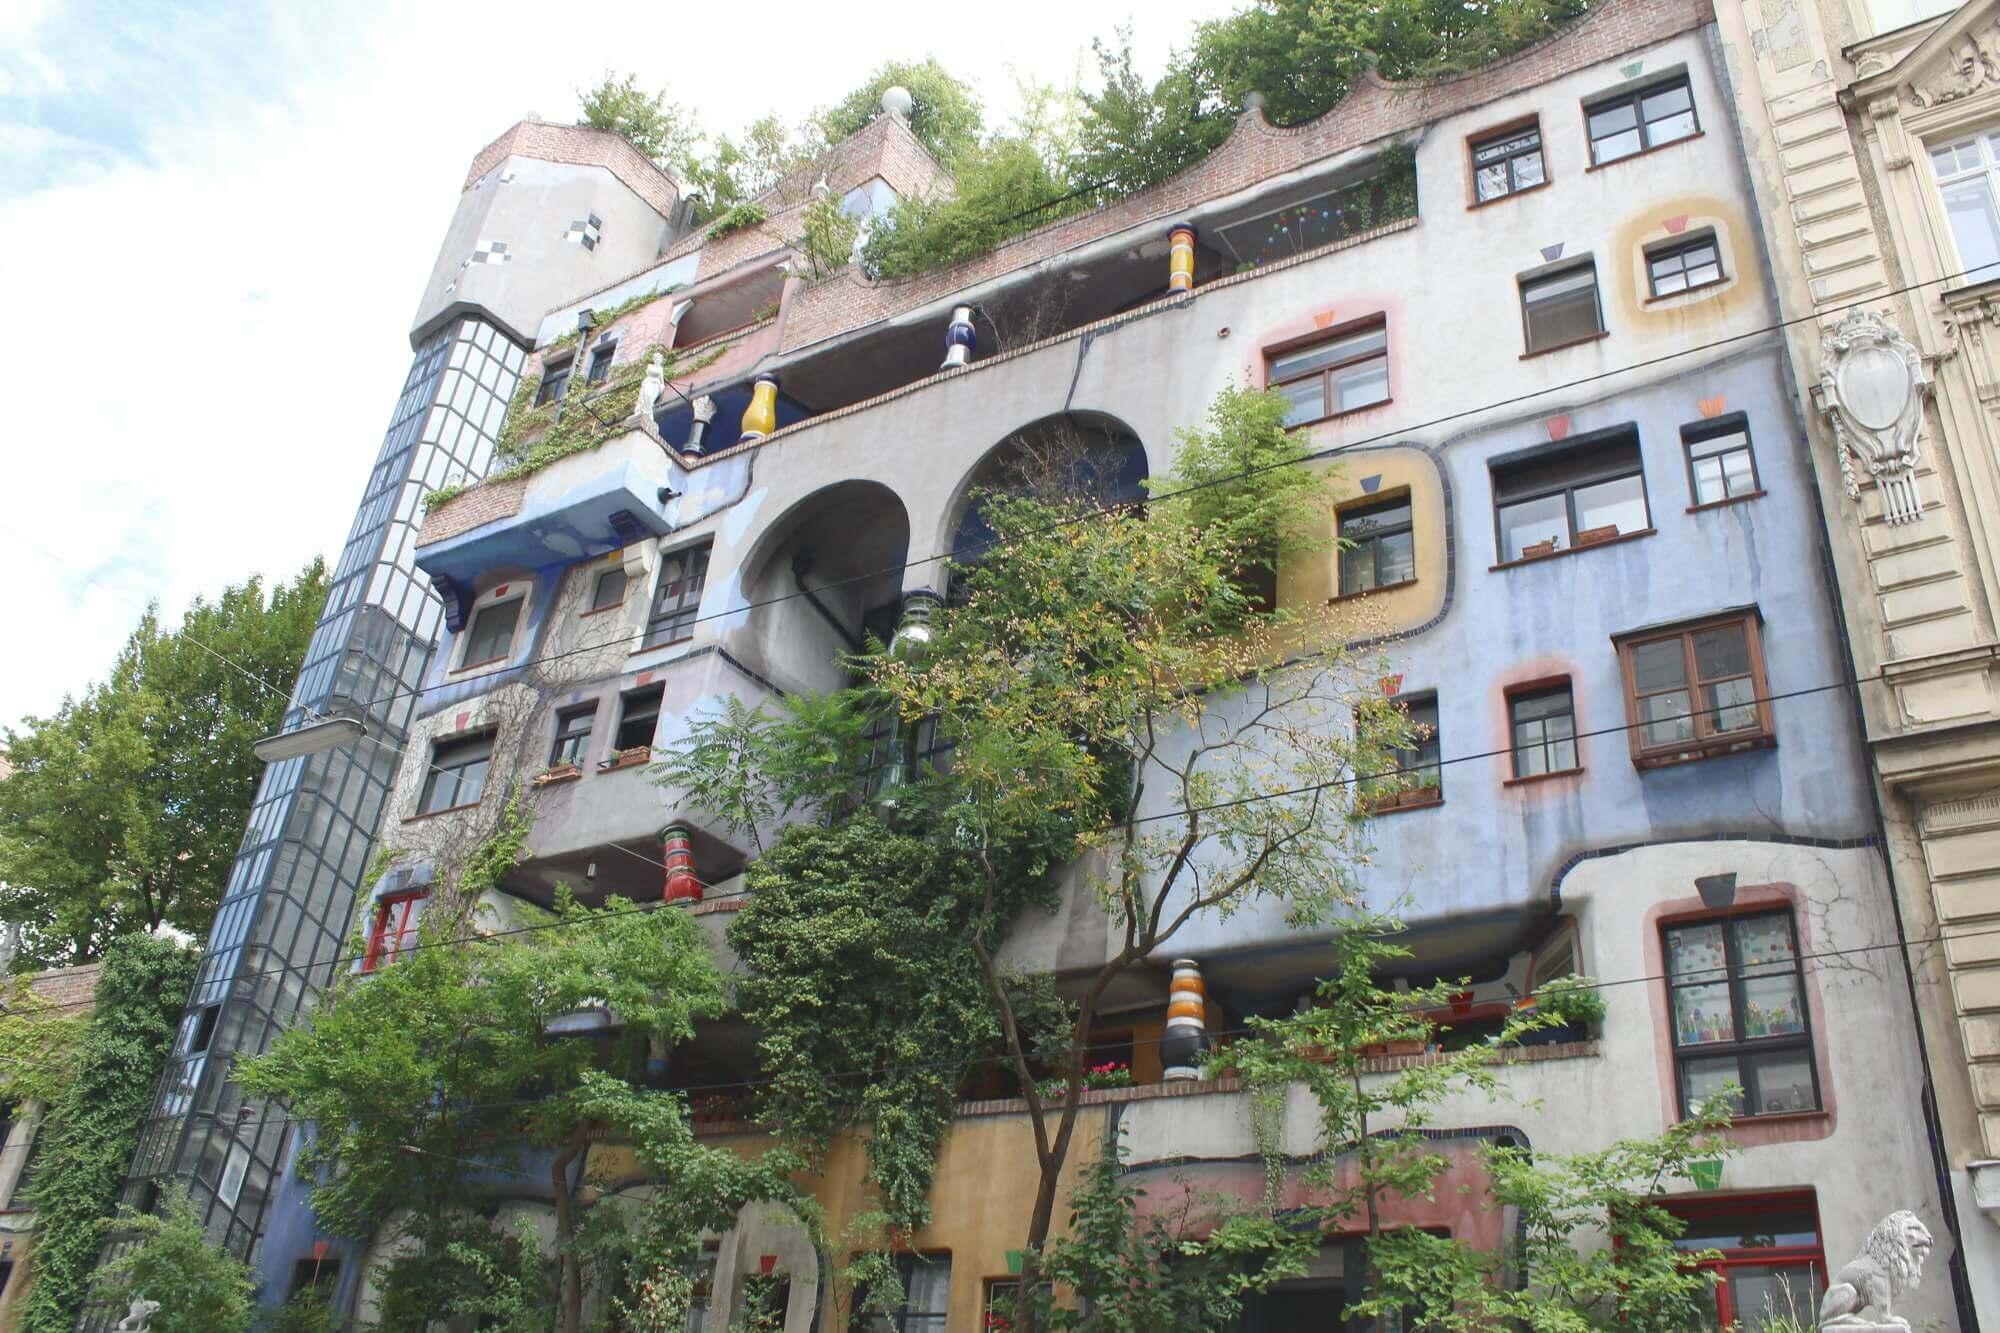 Hundertwasserhaus Wien Frontansicht